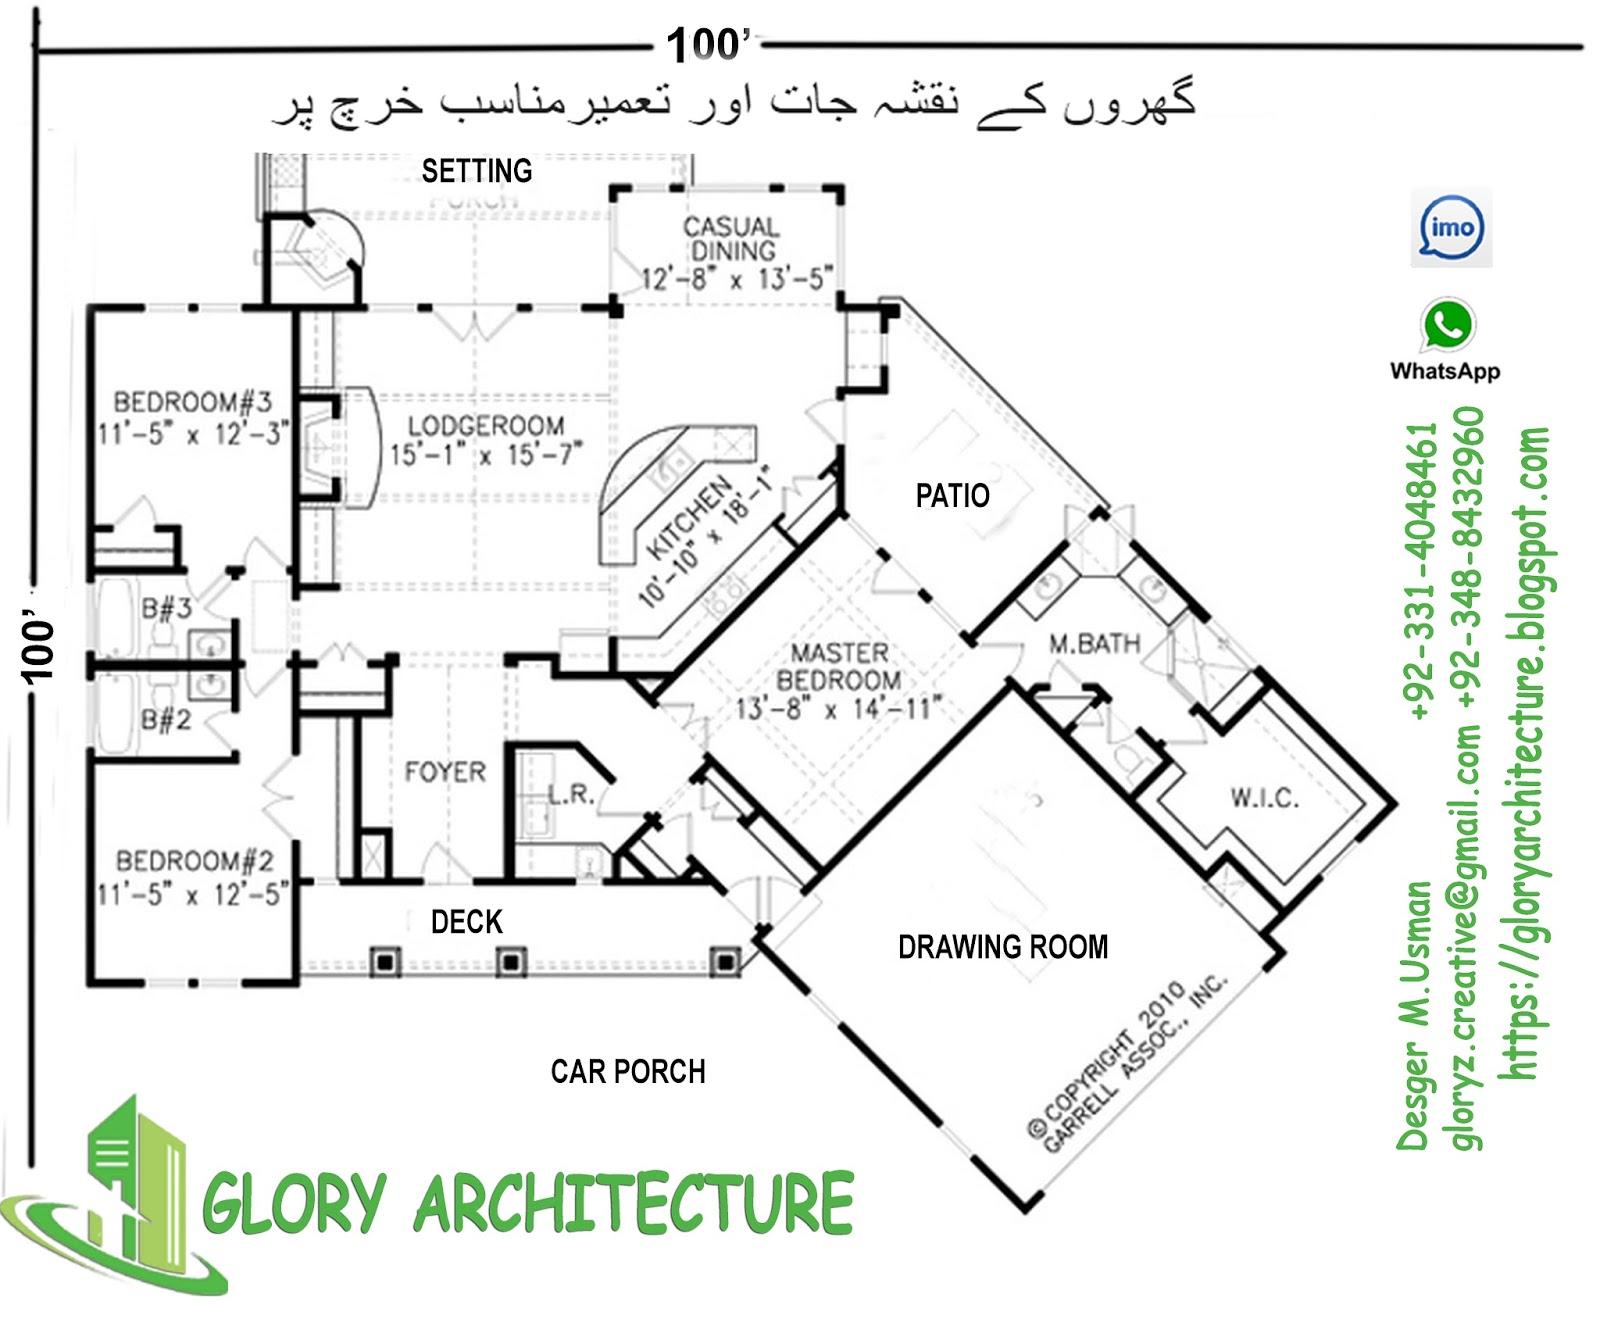 90x100 house plan 150x100 house plan 200x100 house plan for Modern house design map